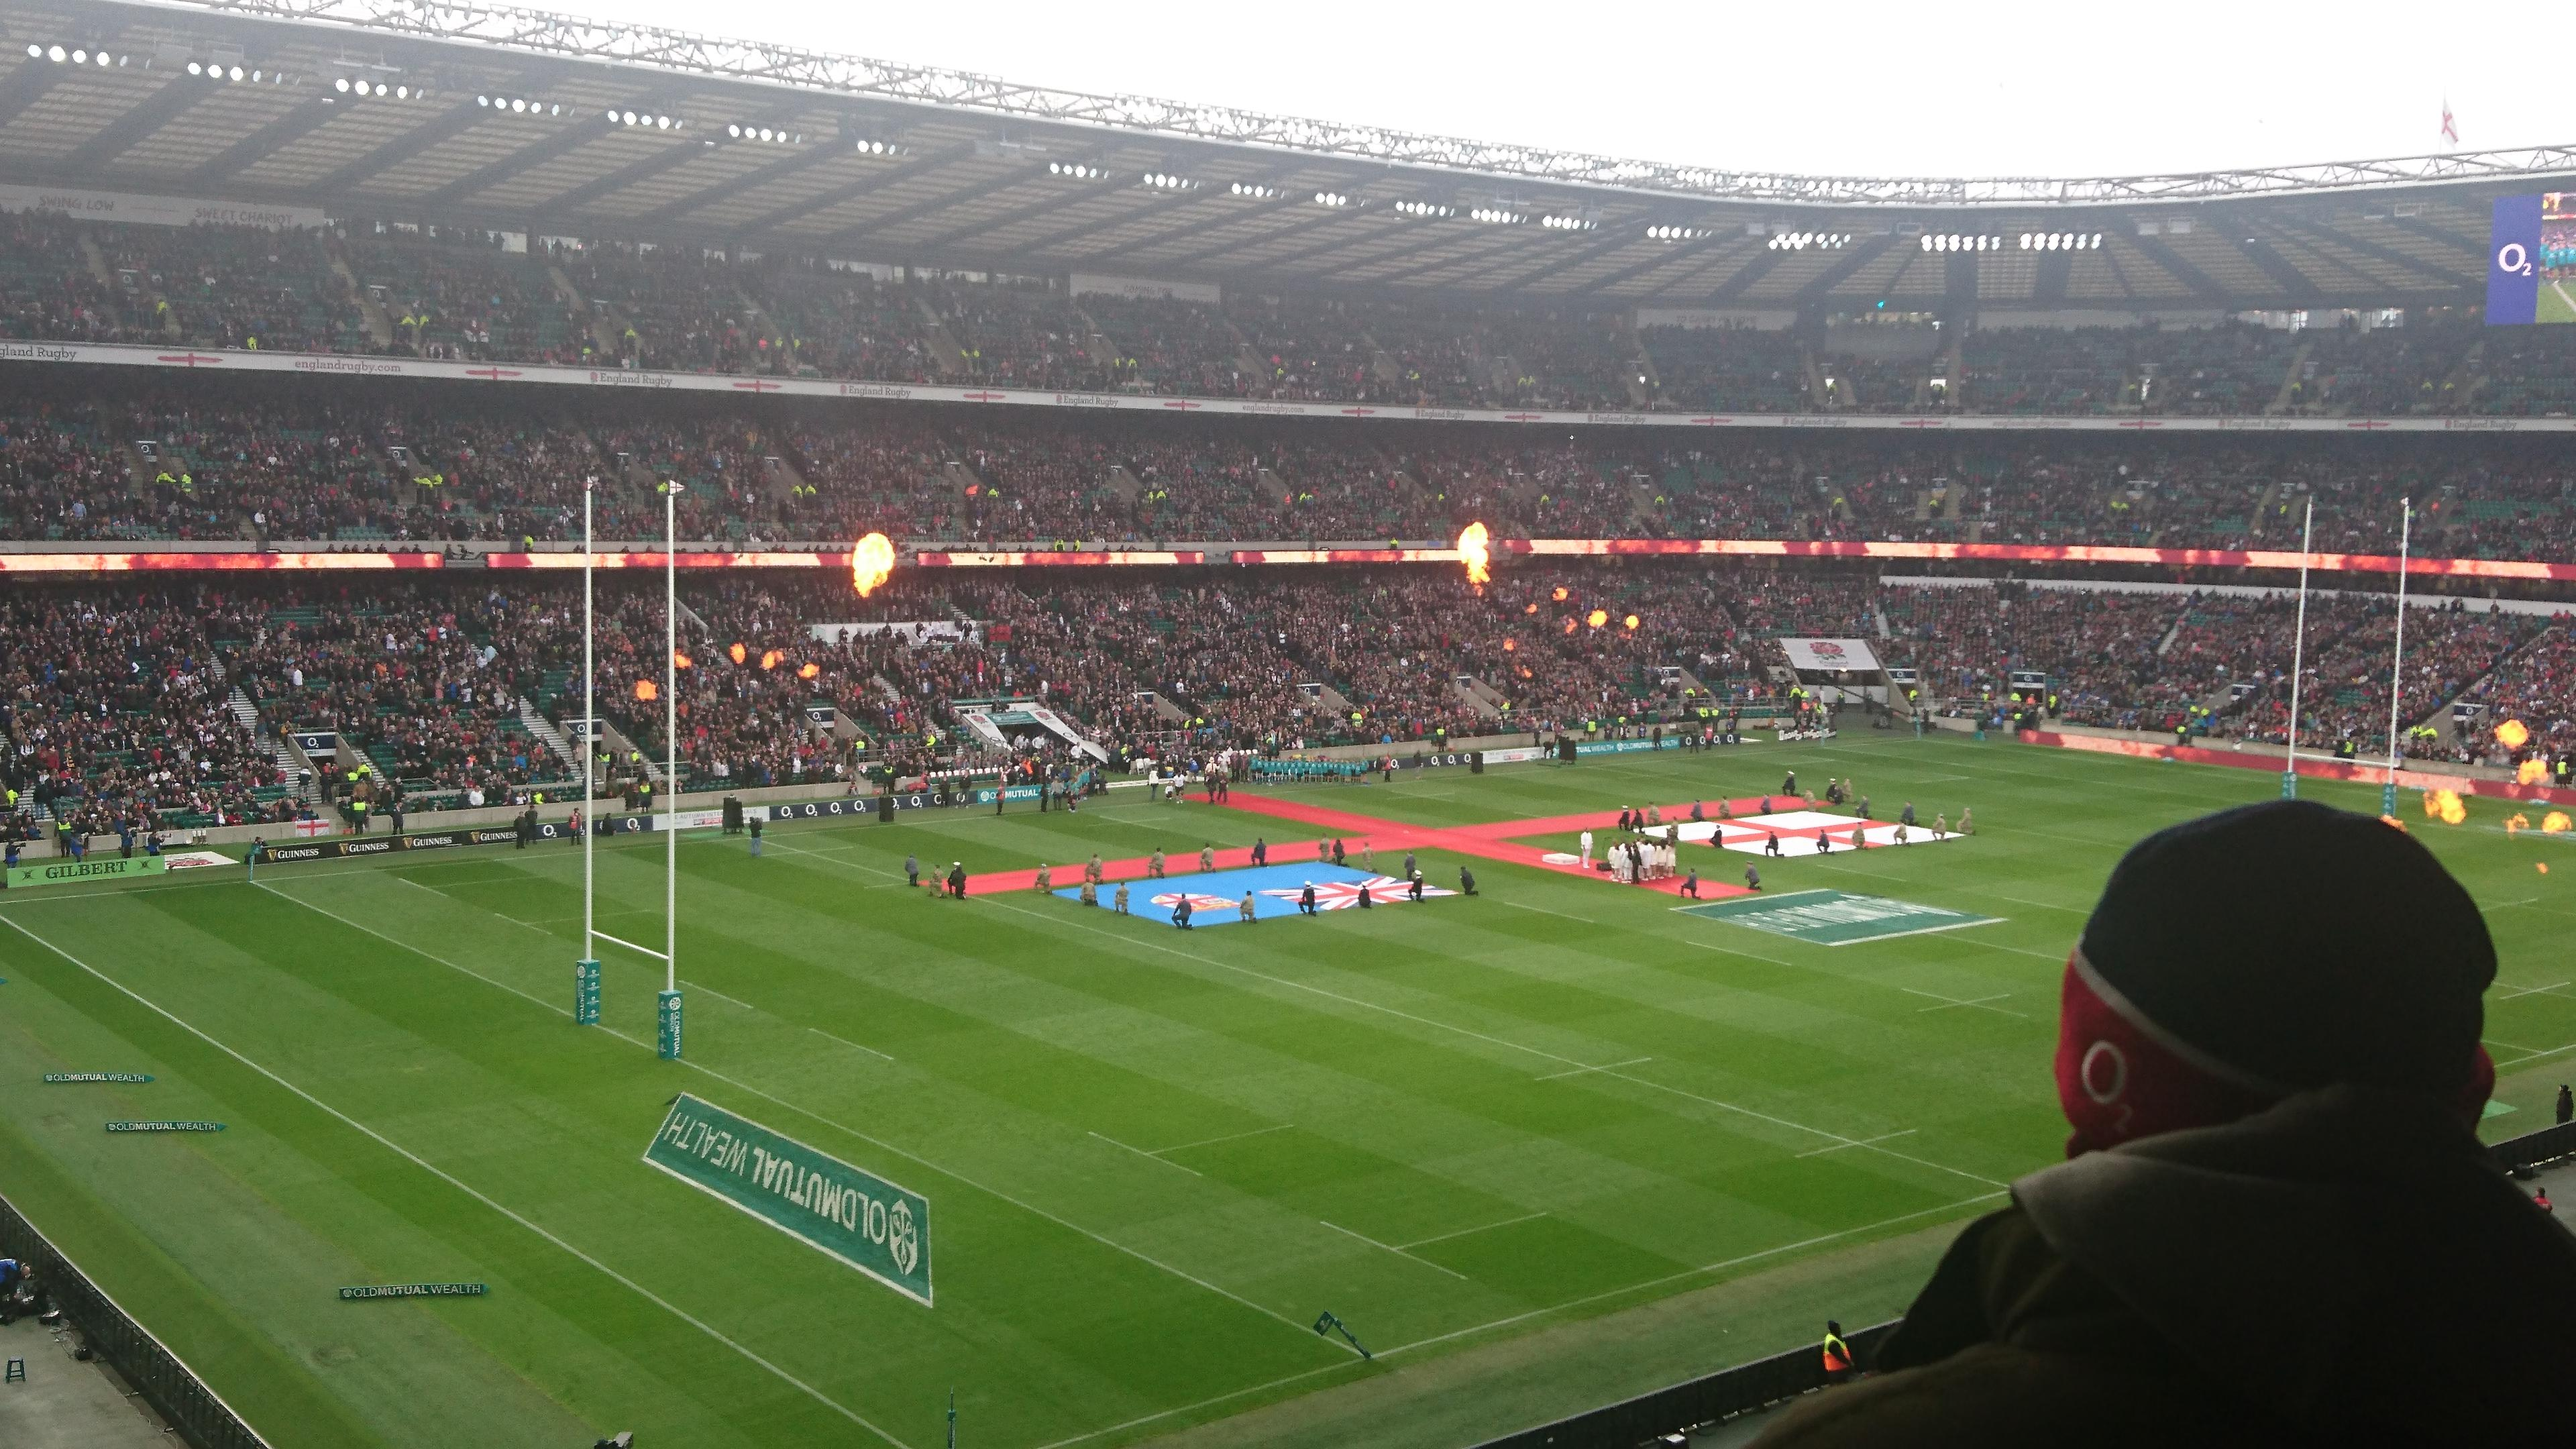 Twickenham Stadium Section M40 Row 65 Seat 15